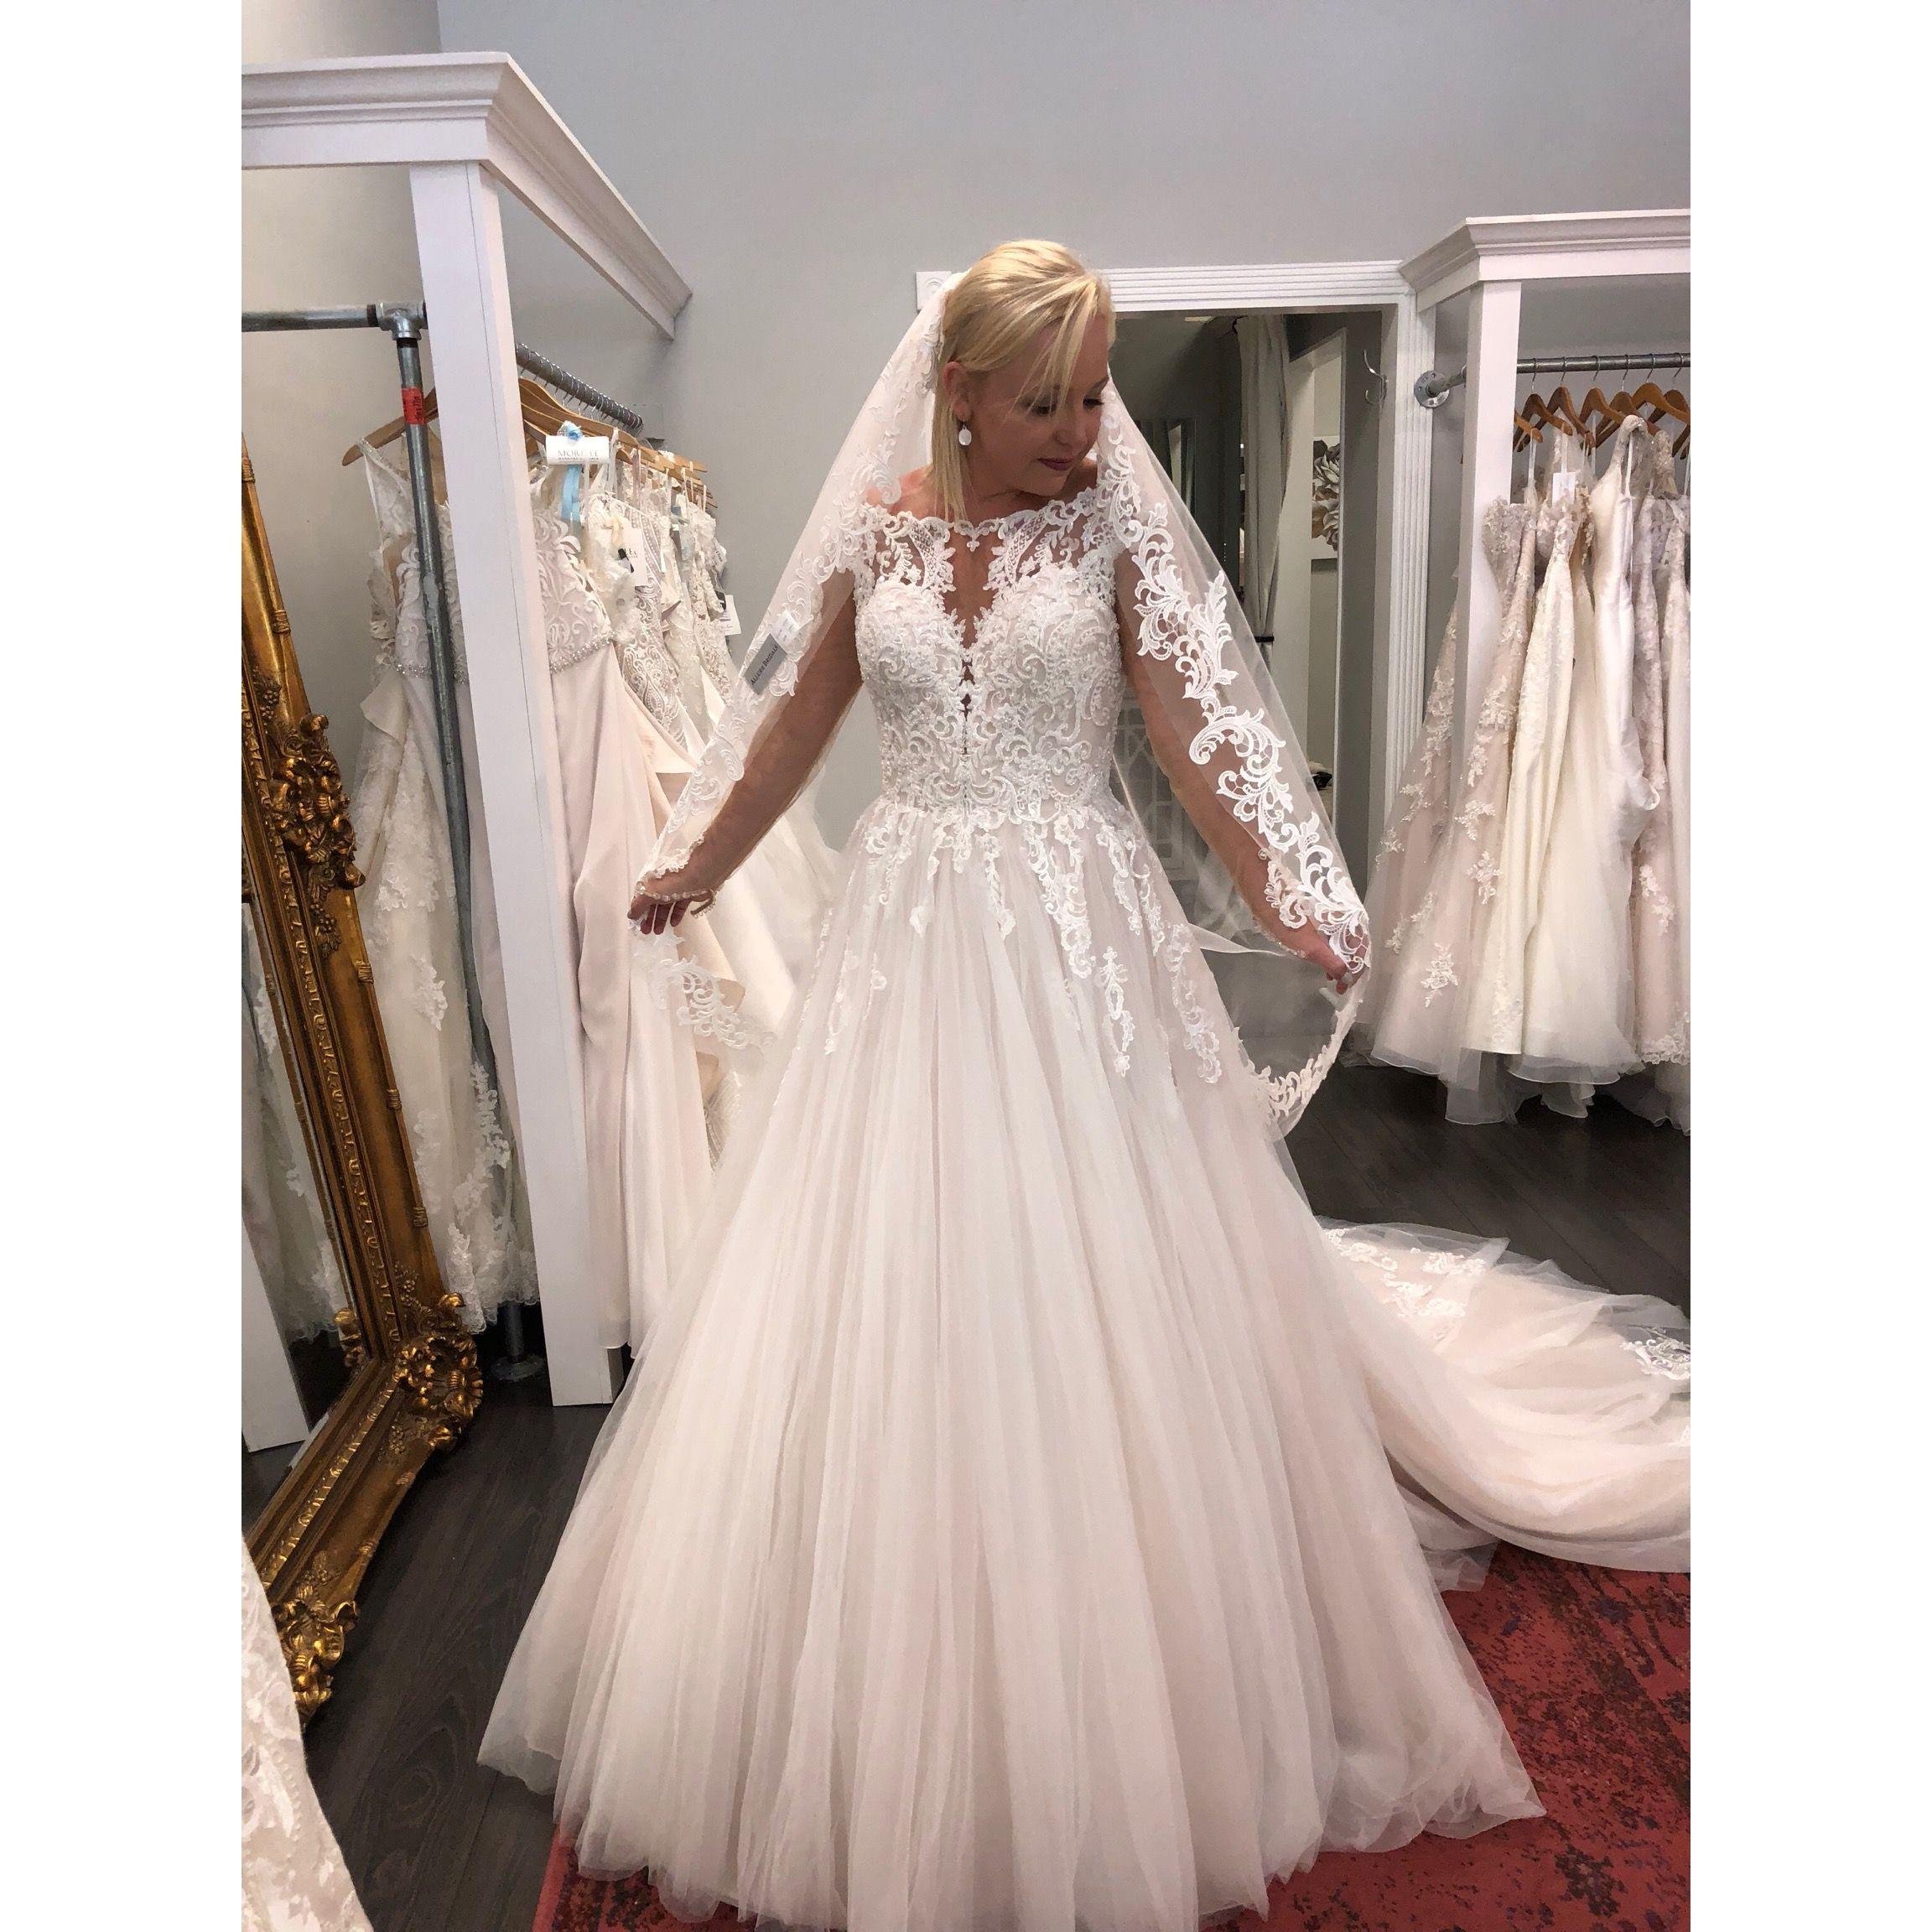 Essense of australia longsleeve ballgown at i do bridal